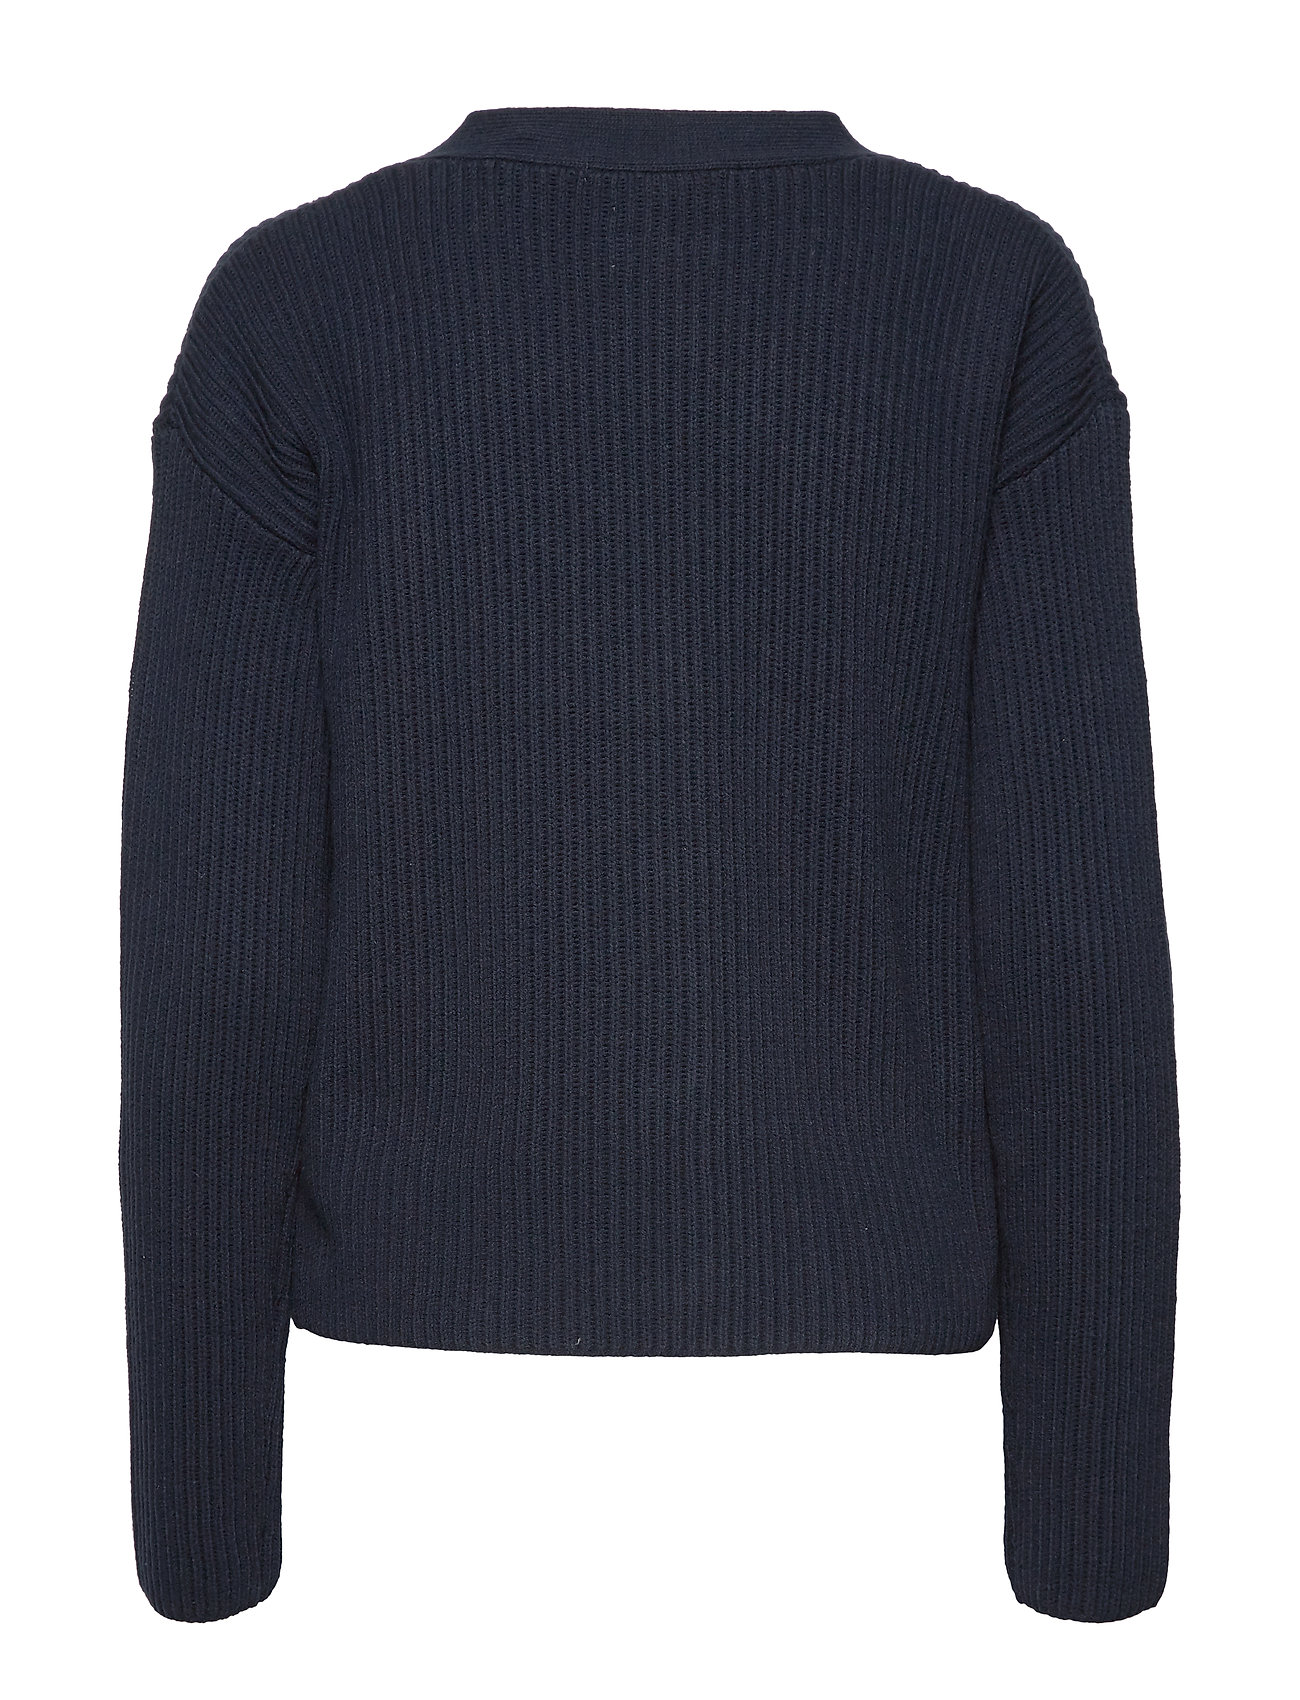 SCOTCH & SODA Strickoberteile & Pullover | V-Neck Chunky Rib Knit Cardigan Cardigan Strickpullover Blau SCOTCH & SODA